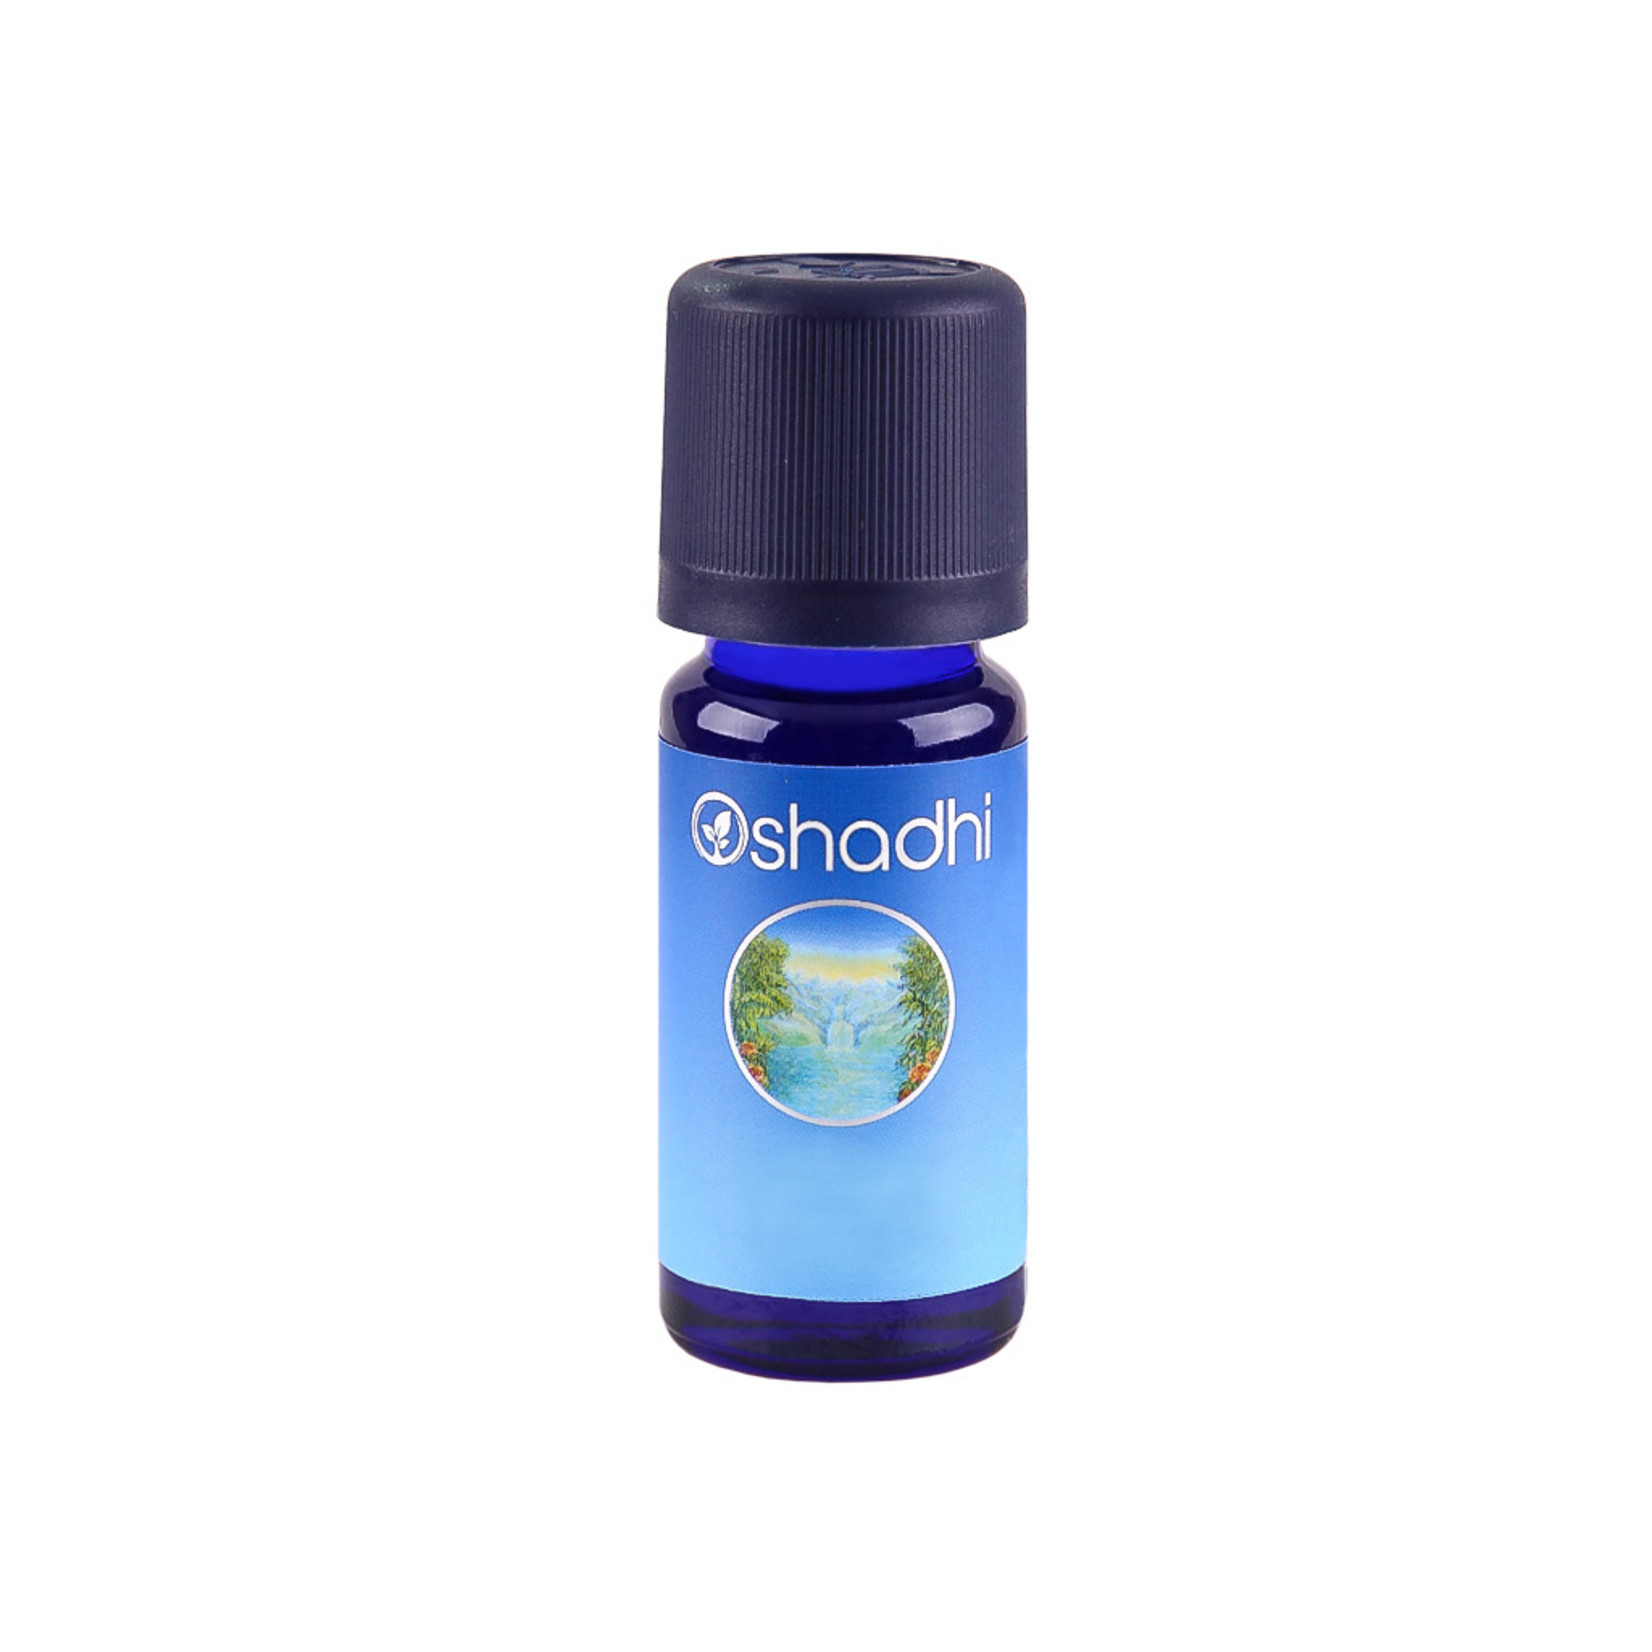 Oshadhi Pepermunt Oshadhi - zuiverend en ontspannend - 10ml